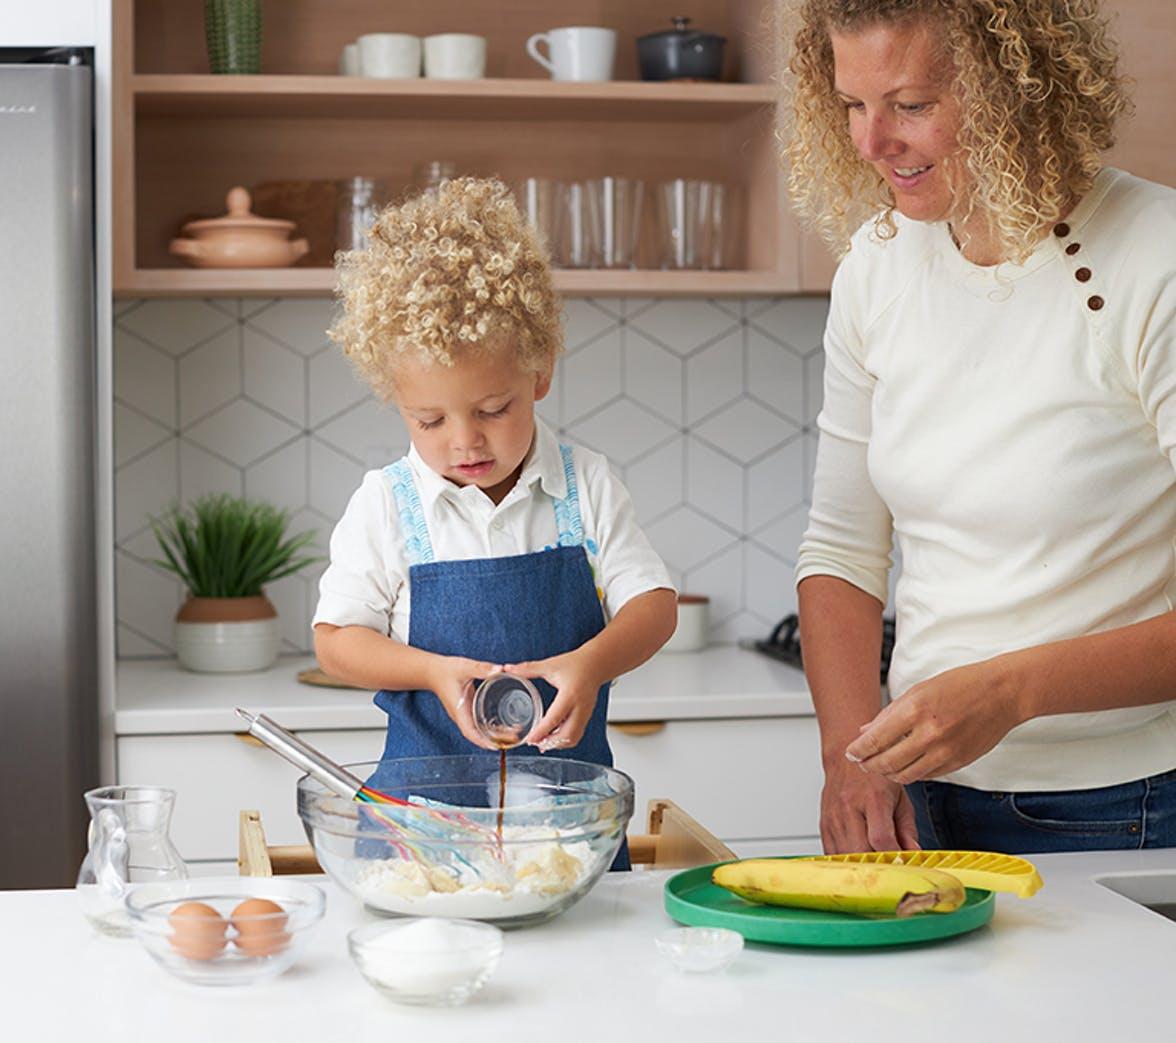 Toddler pouring vanilla into a mixing bowl